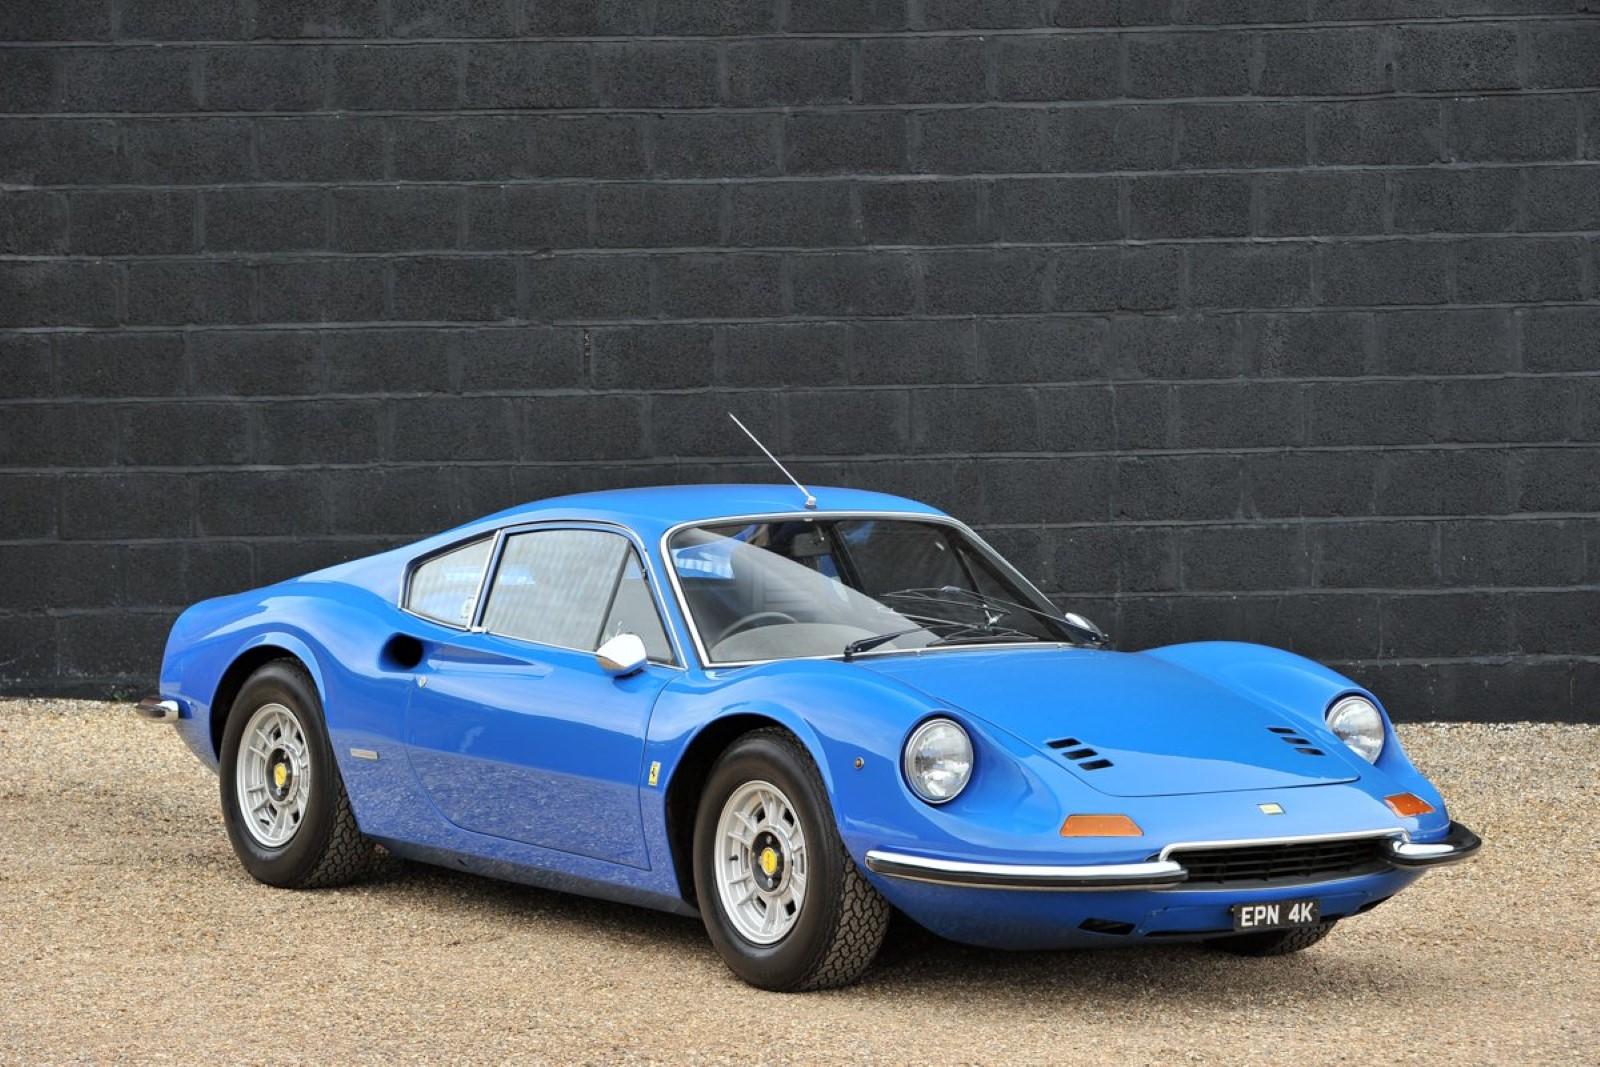 Само за колекционери: Се продава редок примерок од Ferrari Dino